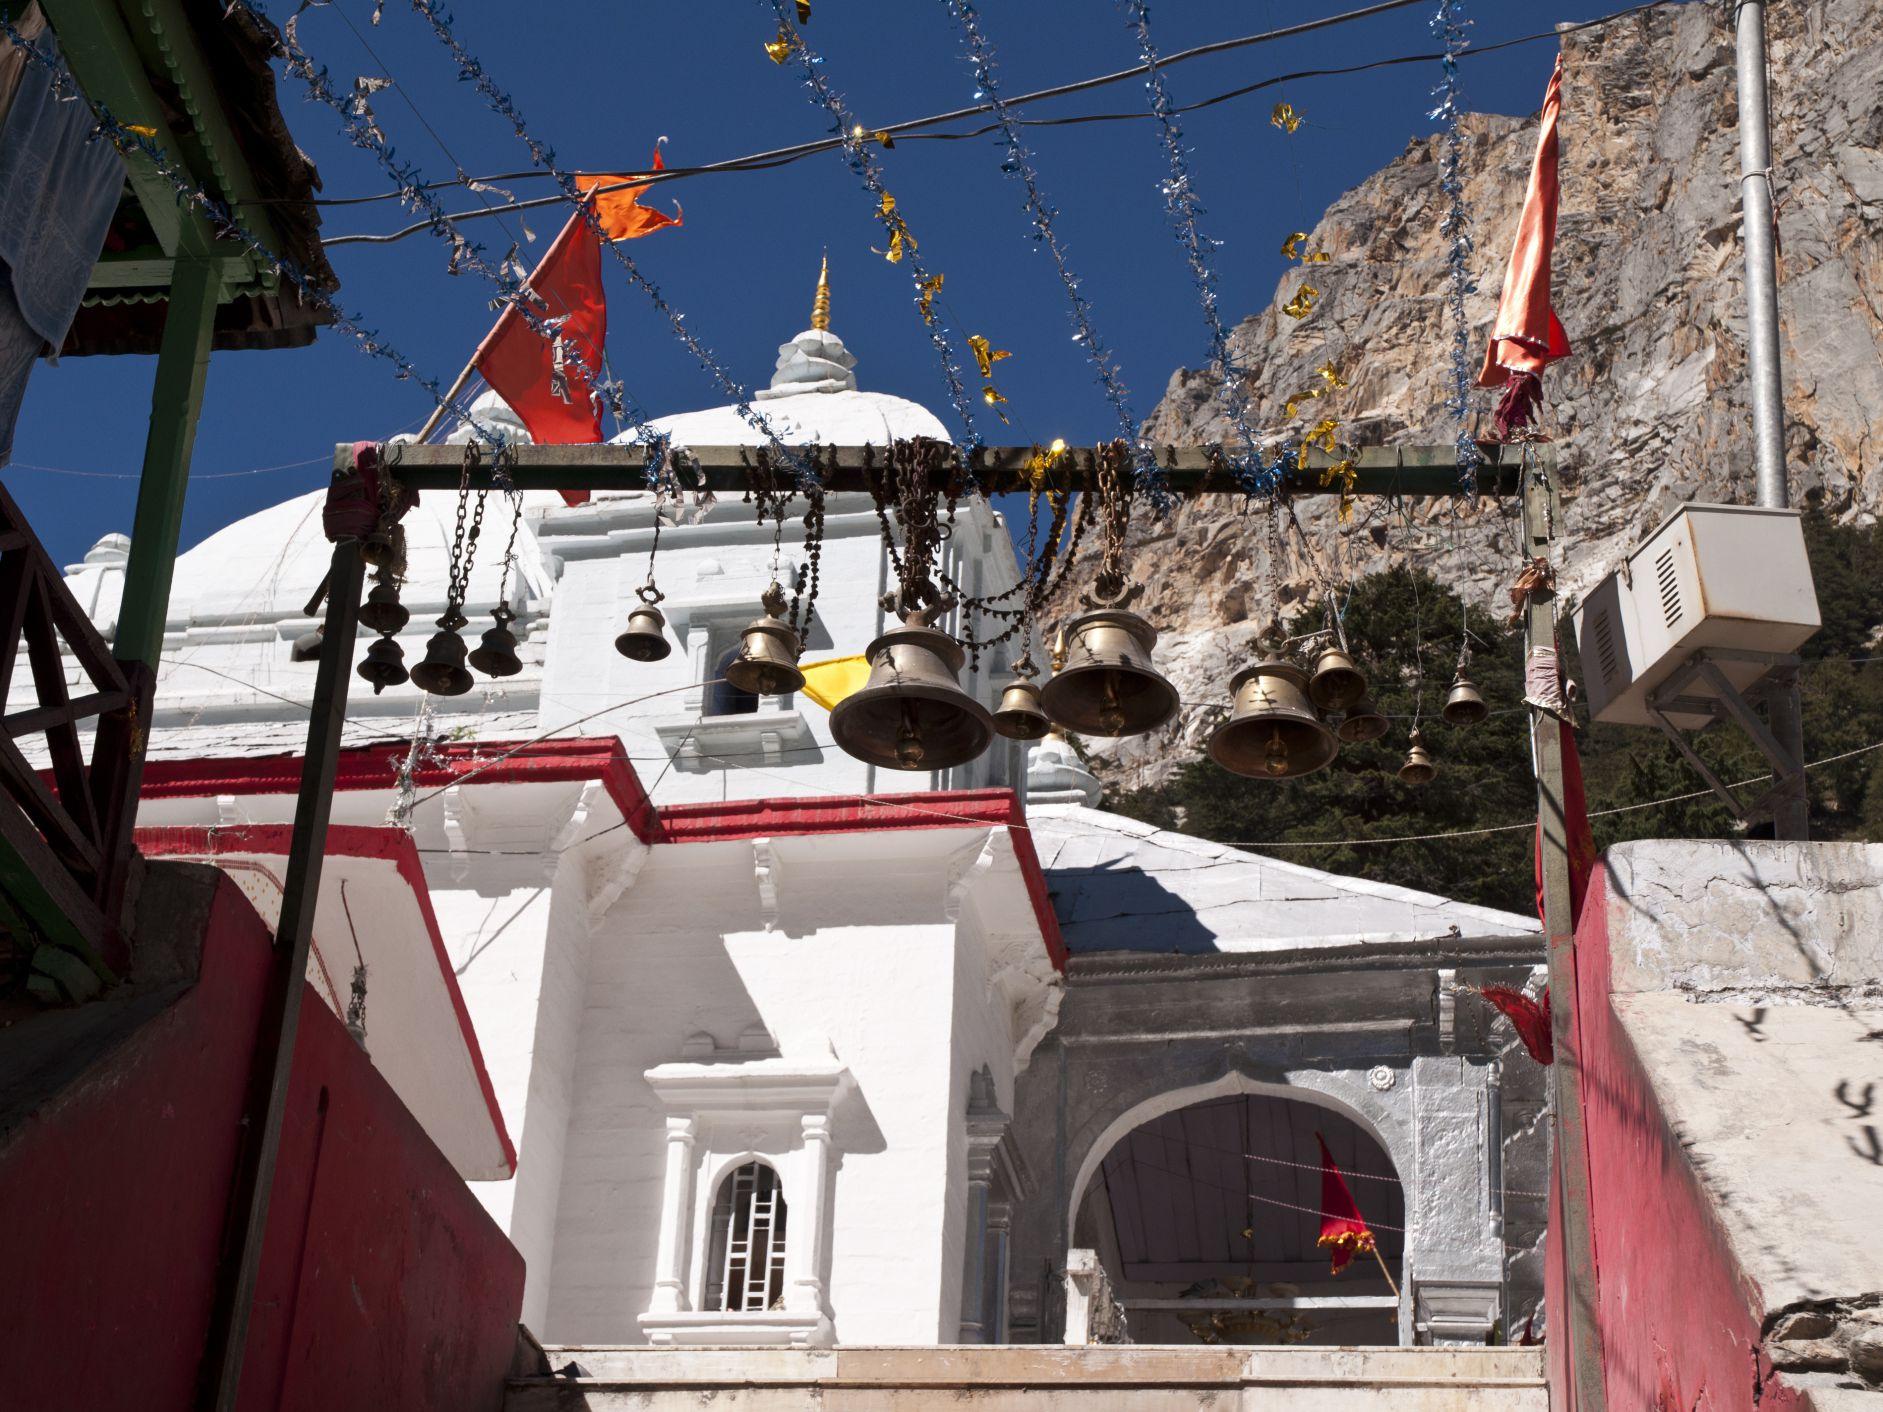 2019 Uttarakhand Char Dham Yatra: Essential Guide